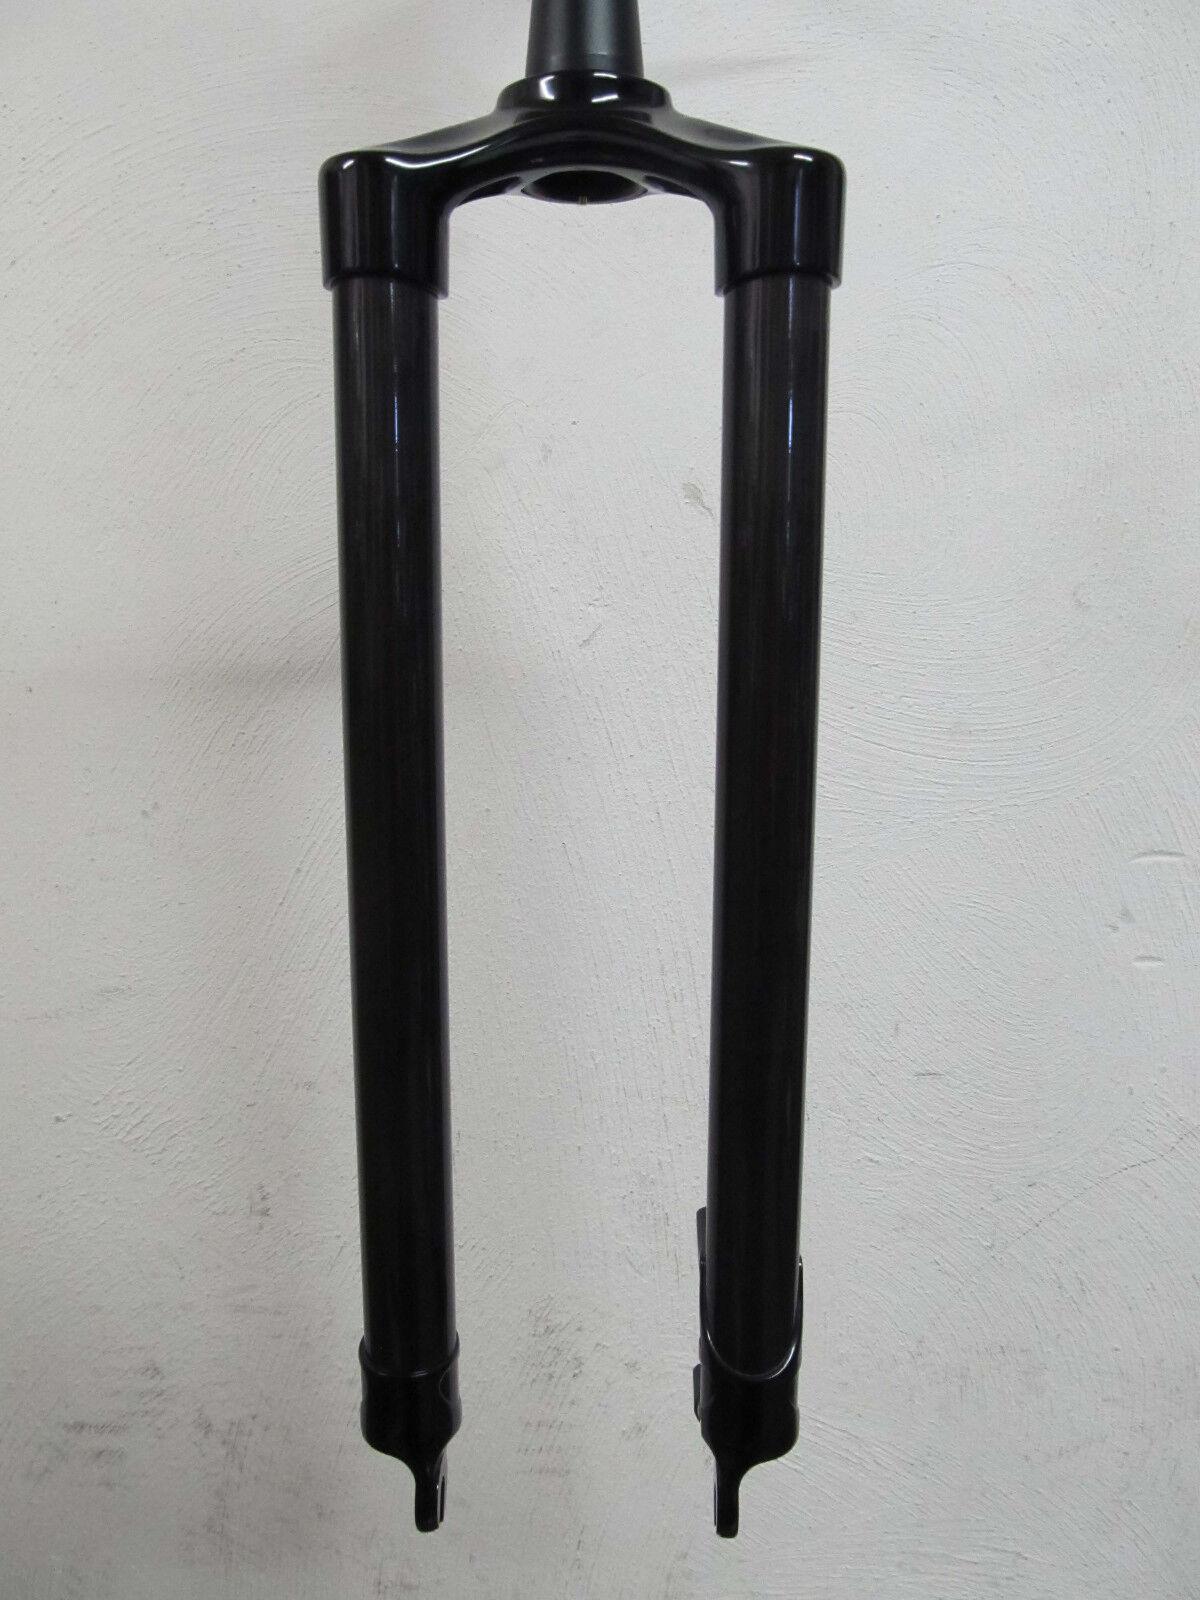 Helibiciclettas autobon Comp 29  MTB Disc Only autobonForcella tuttiuminio Forcella